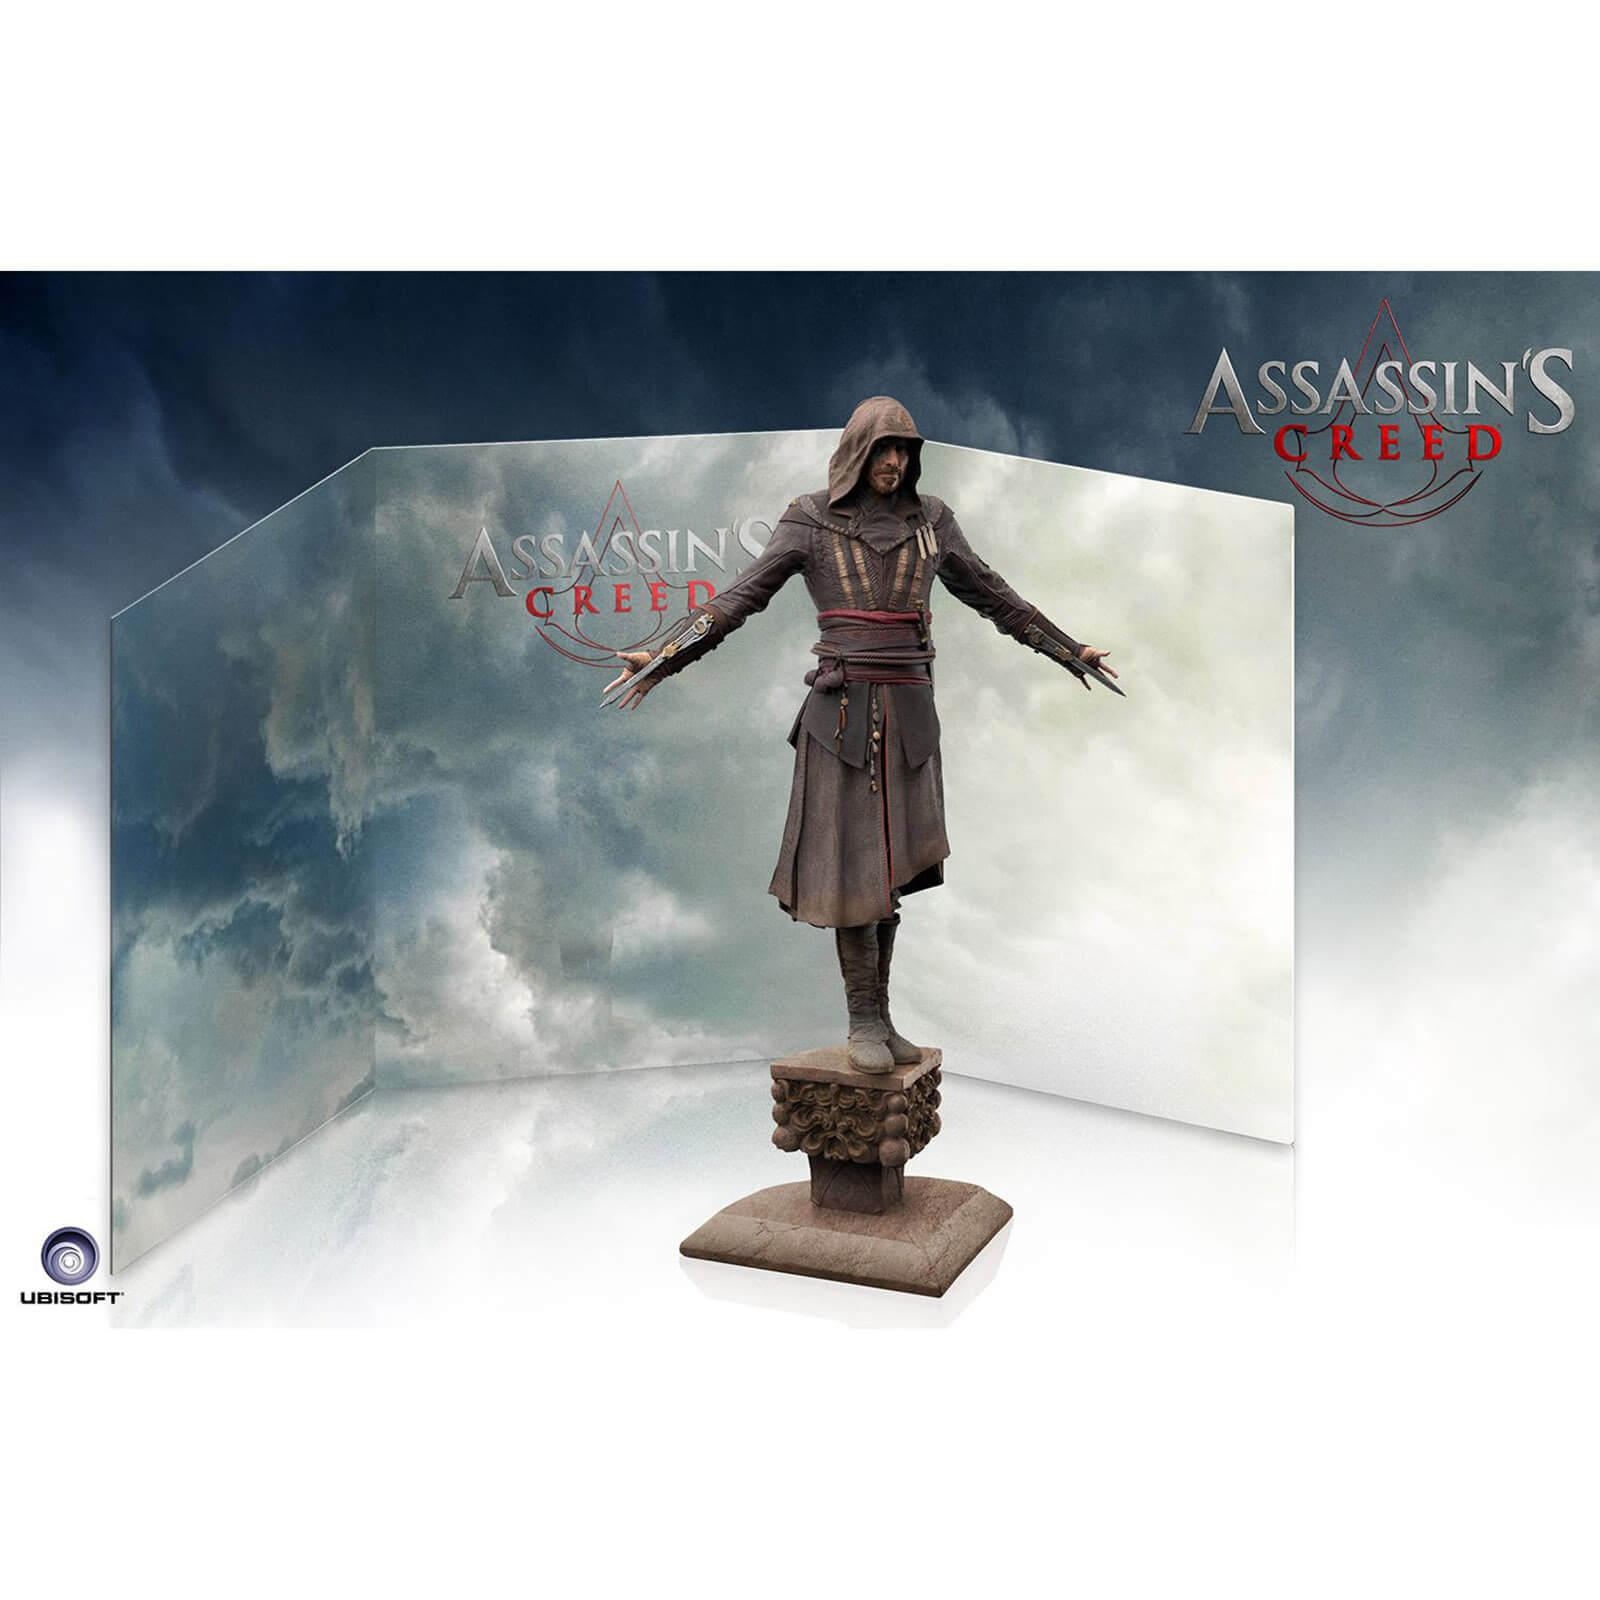 Statuette de collection Assassin's Creed - 35.5 cm